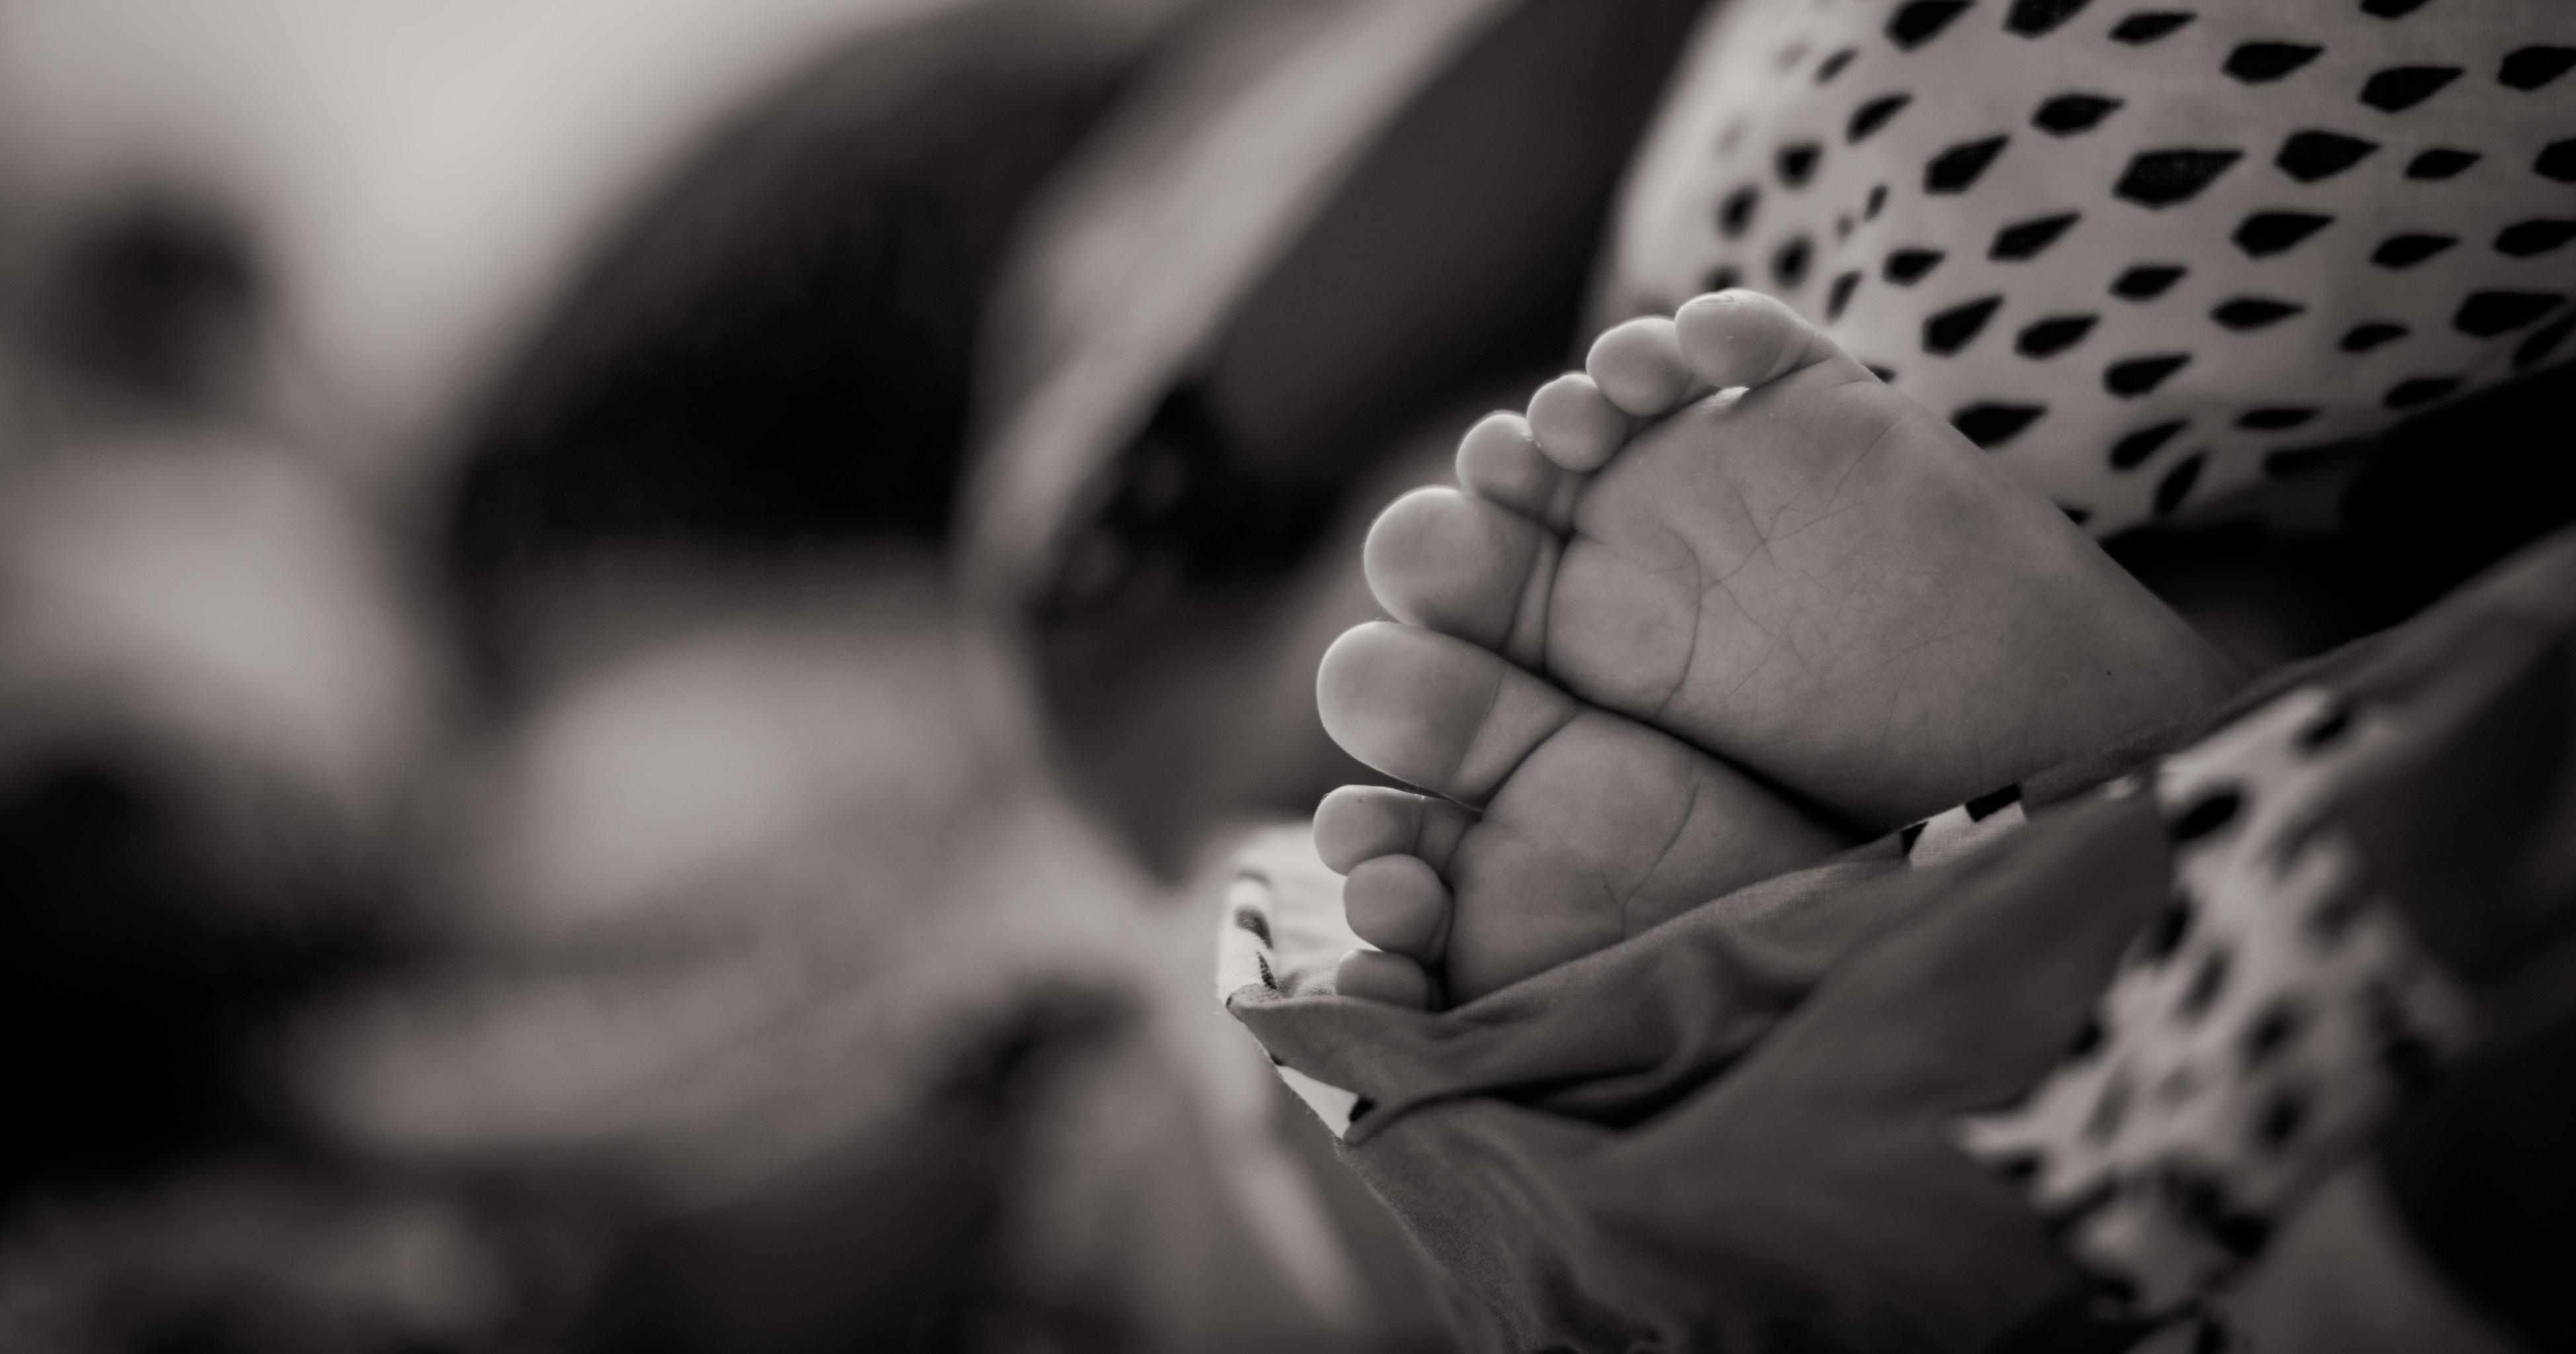 baby feet janko-ferlic-152866-unsplash